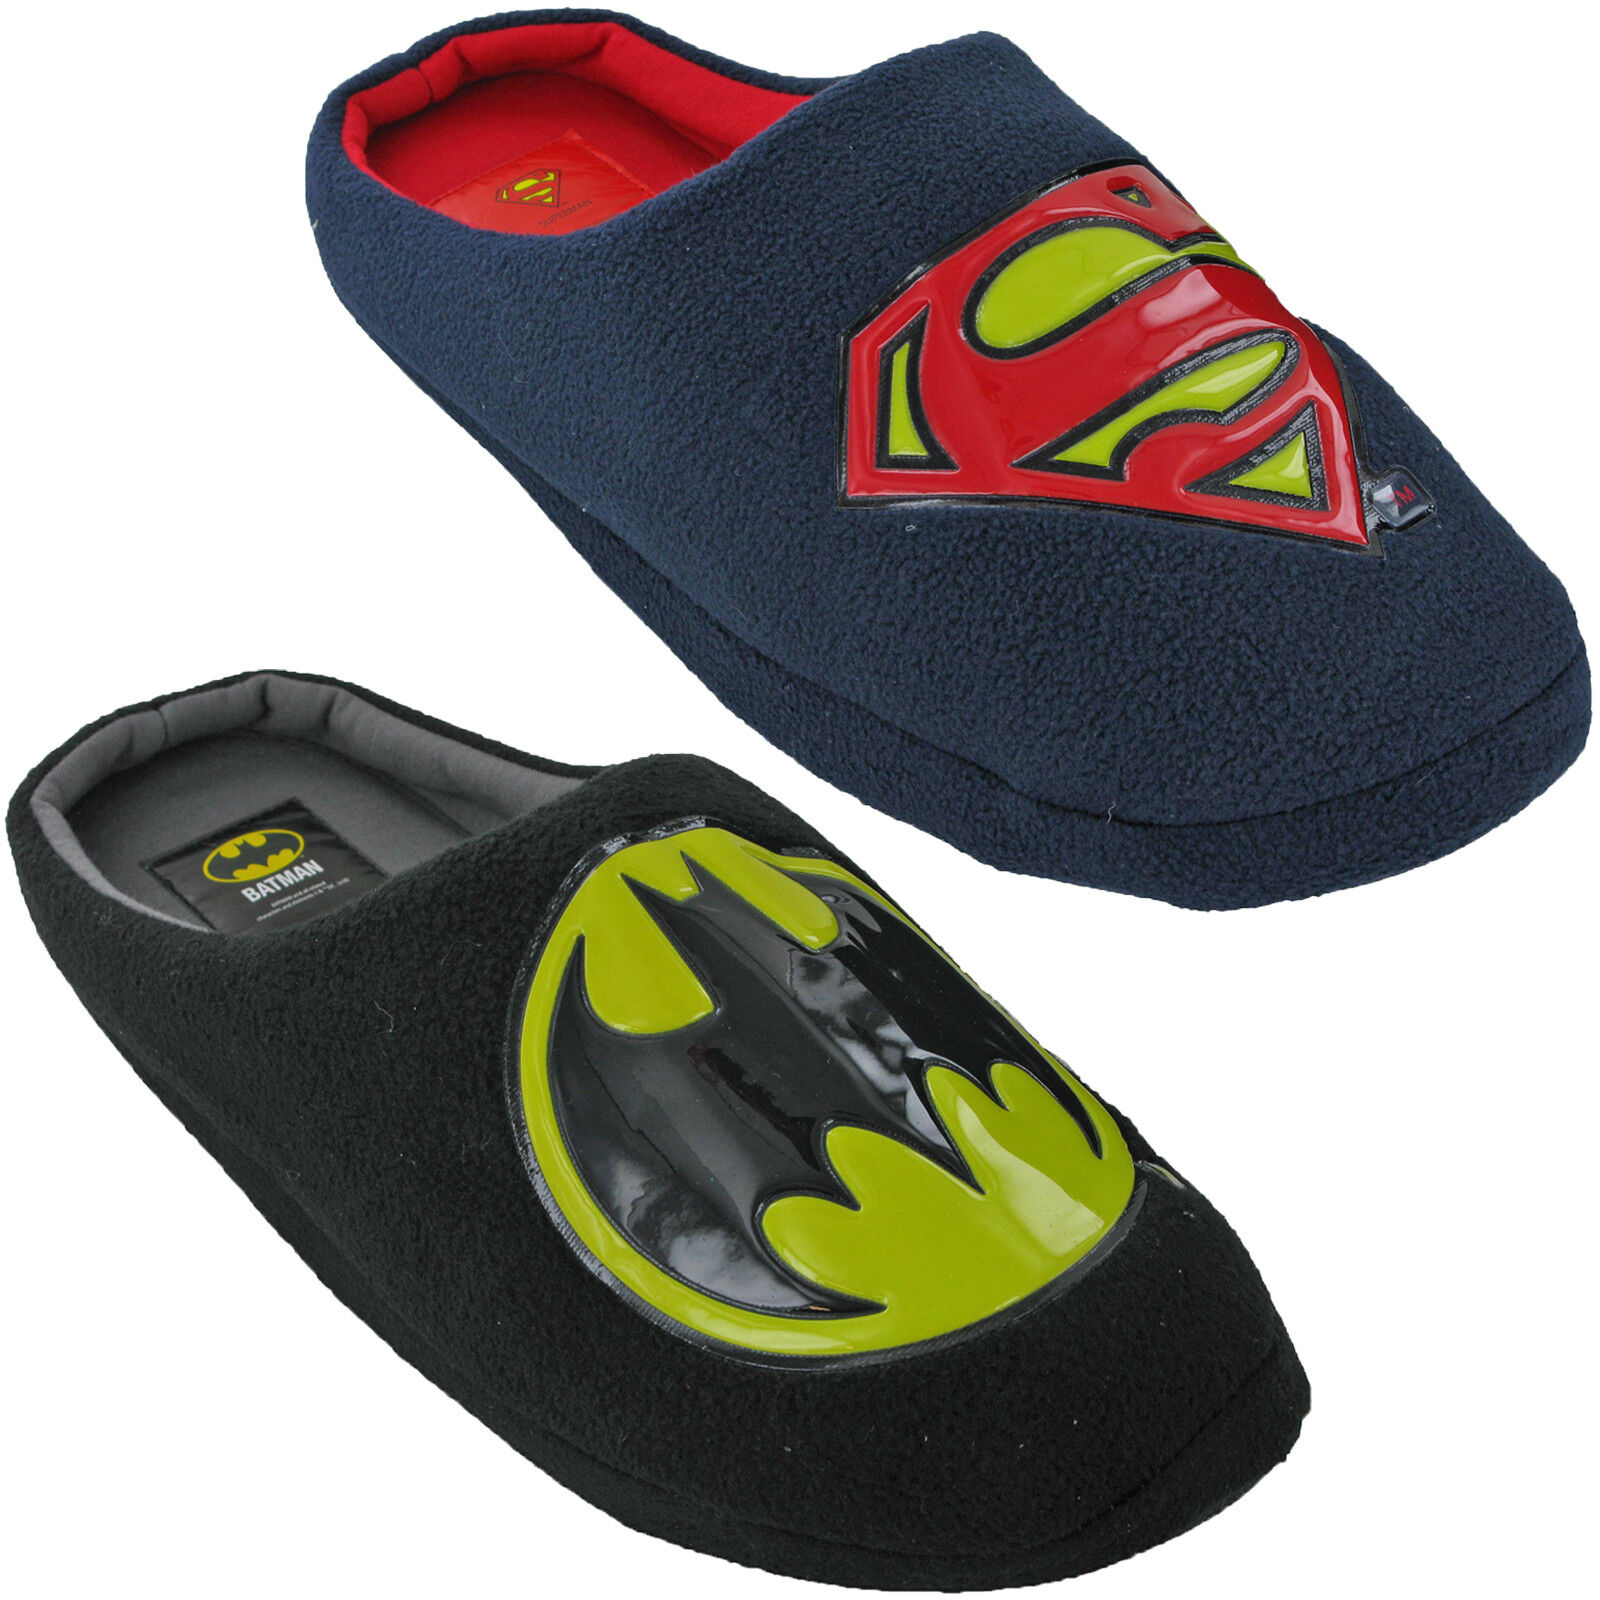 c3166e7f16ae Details about Batman Superman Velour Mule Slippers Novelty DC COMICS Mens  Slip On Warm Fun